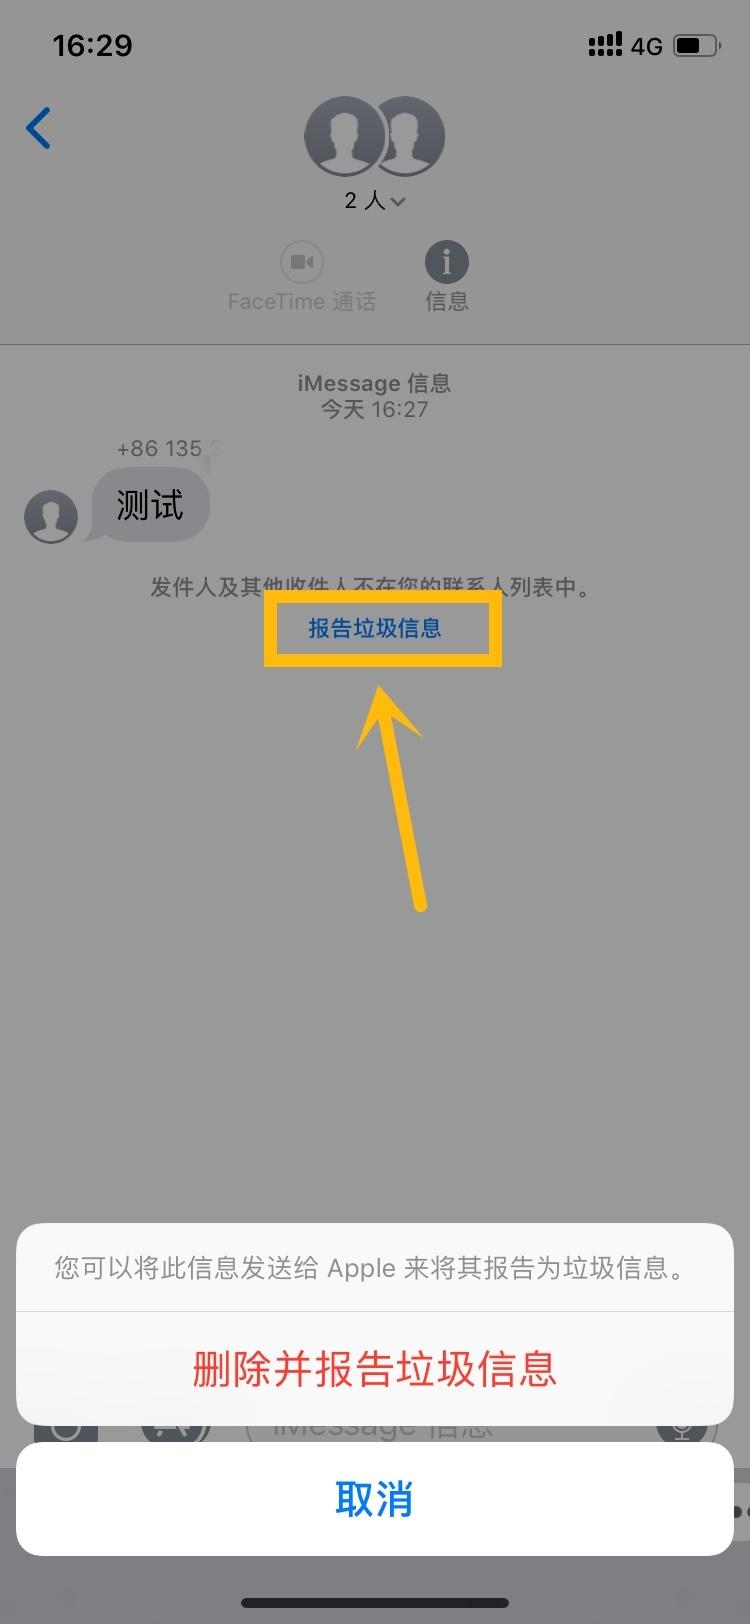 imessage是什么(imessage什么意思呢)插图(7)